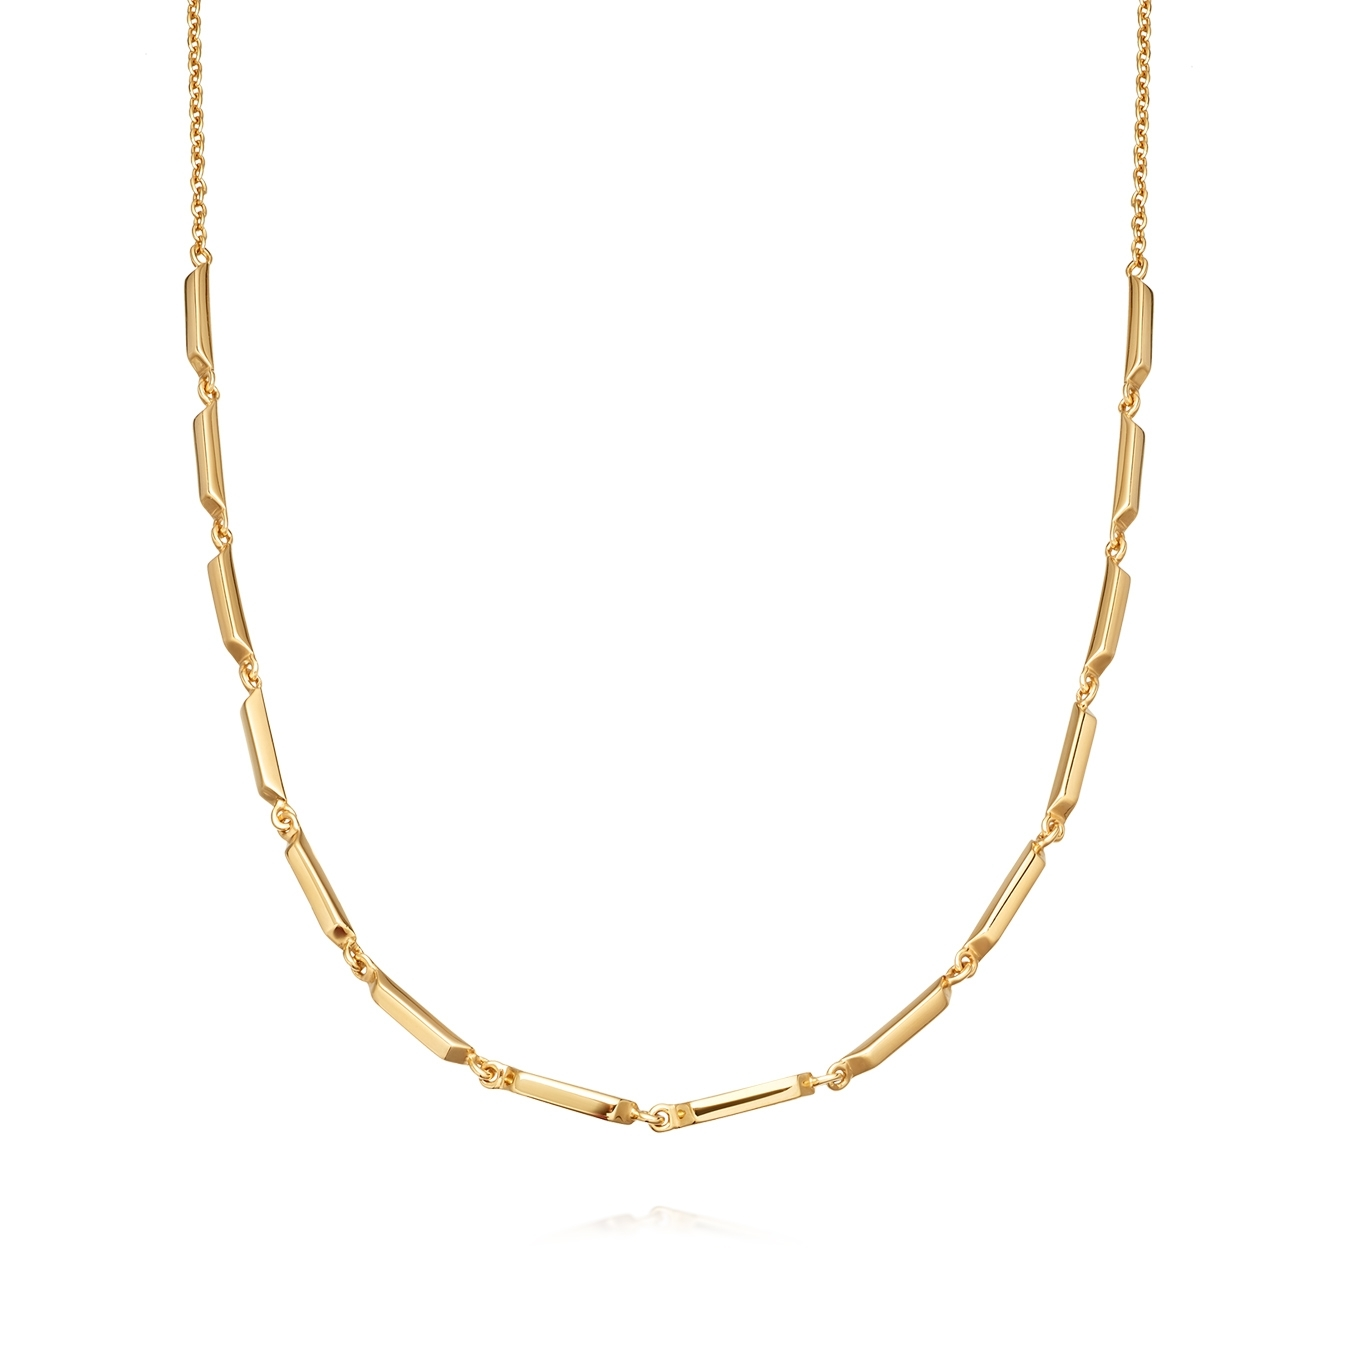 Aubar Necklace